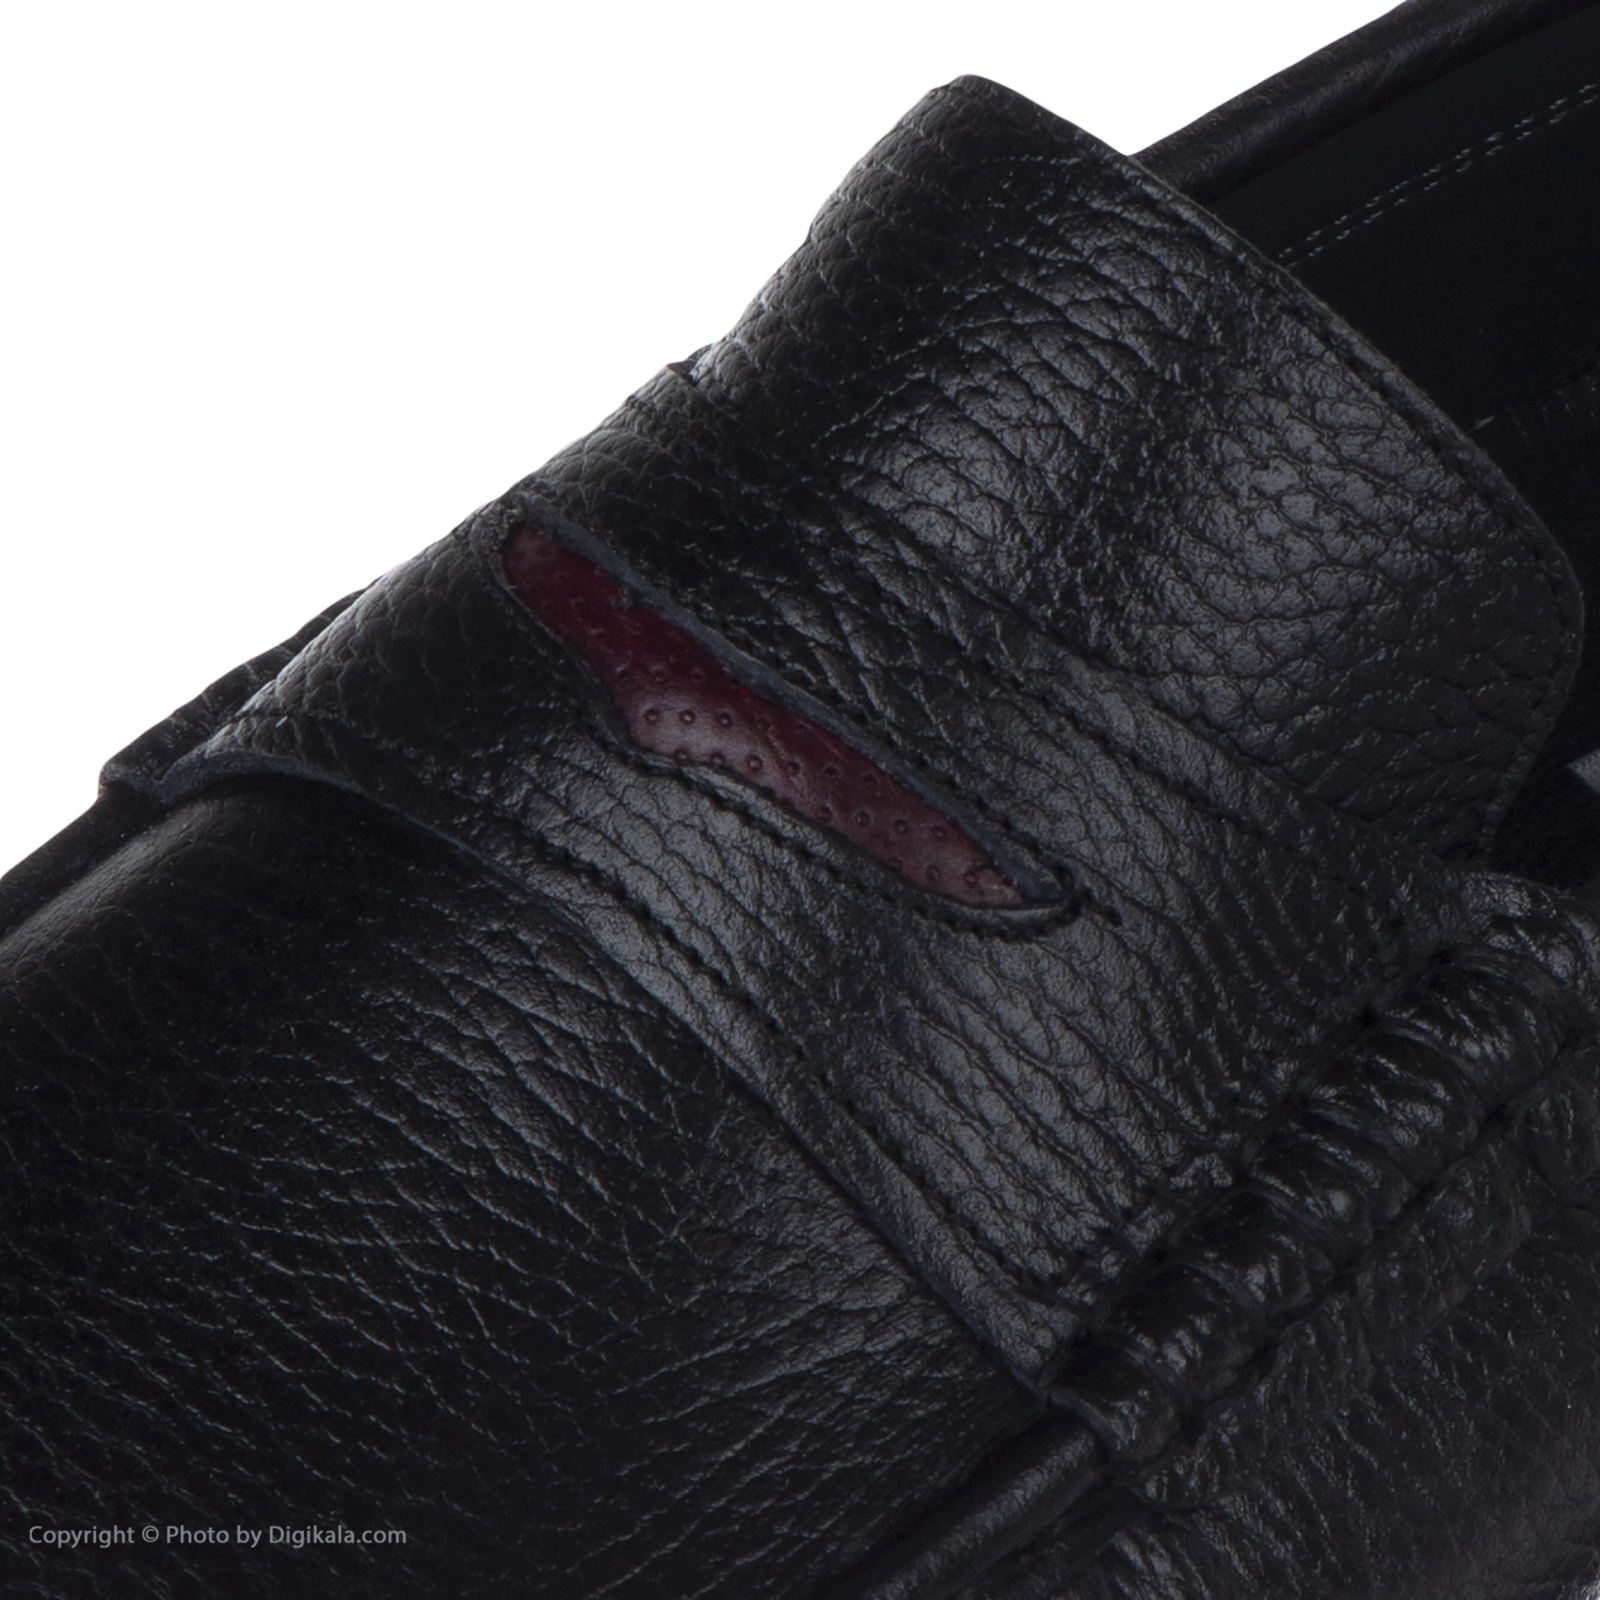 کفش روزمره مردانه ساتین مدل 7611A503101 -  - 8